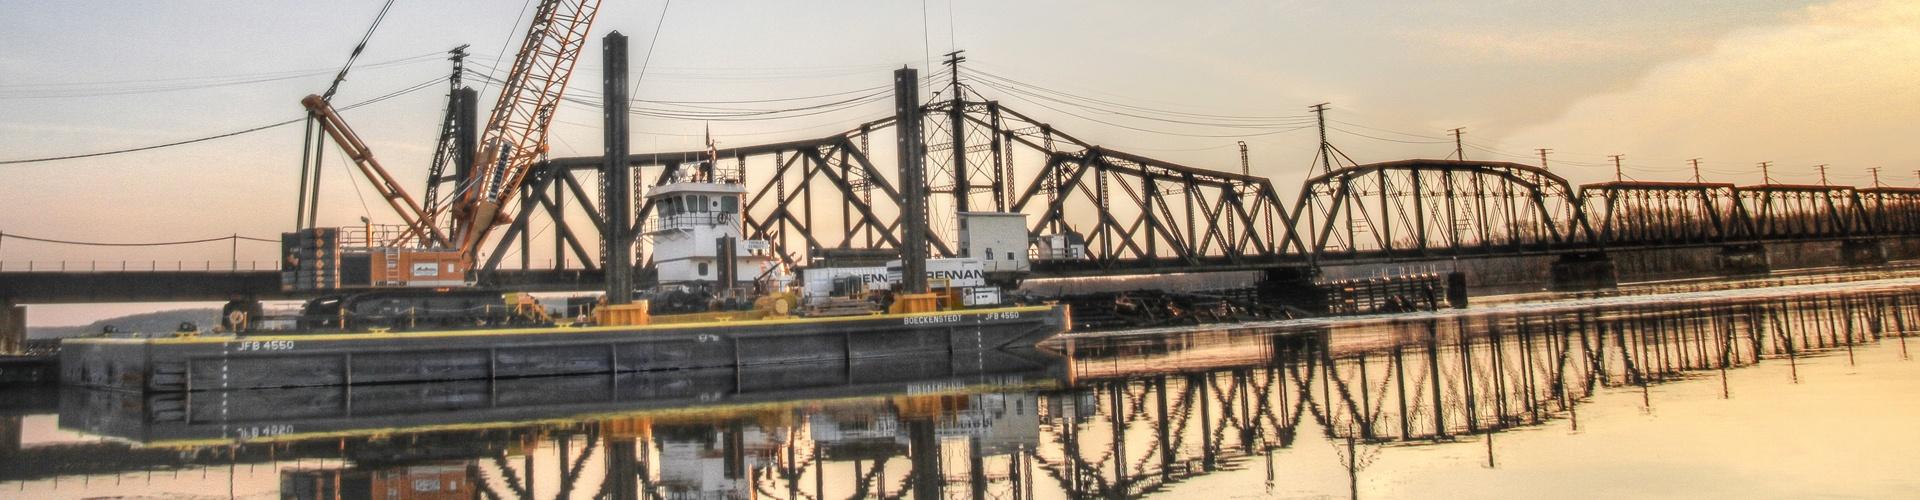 marine support, barge construction, railroad construction services, railroad contractors, bridge replacements, bridge repairs, railroad bridge repairs, derailment assists, derailment cleanups,